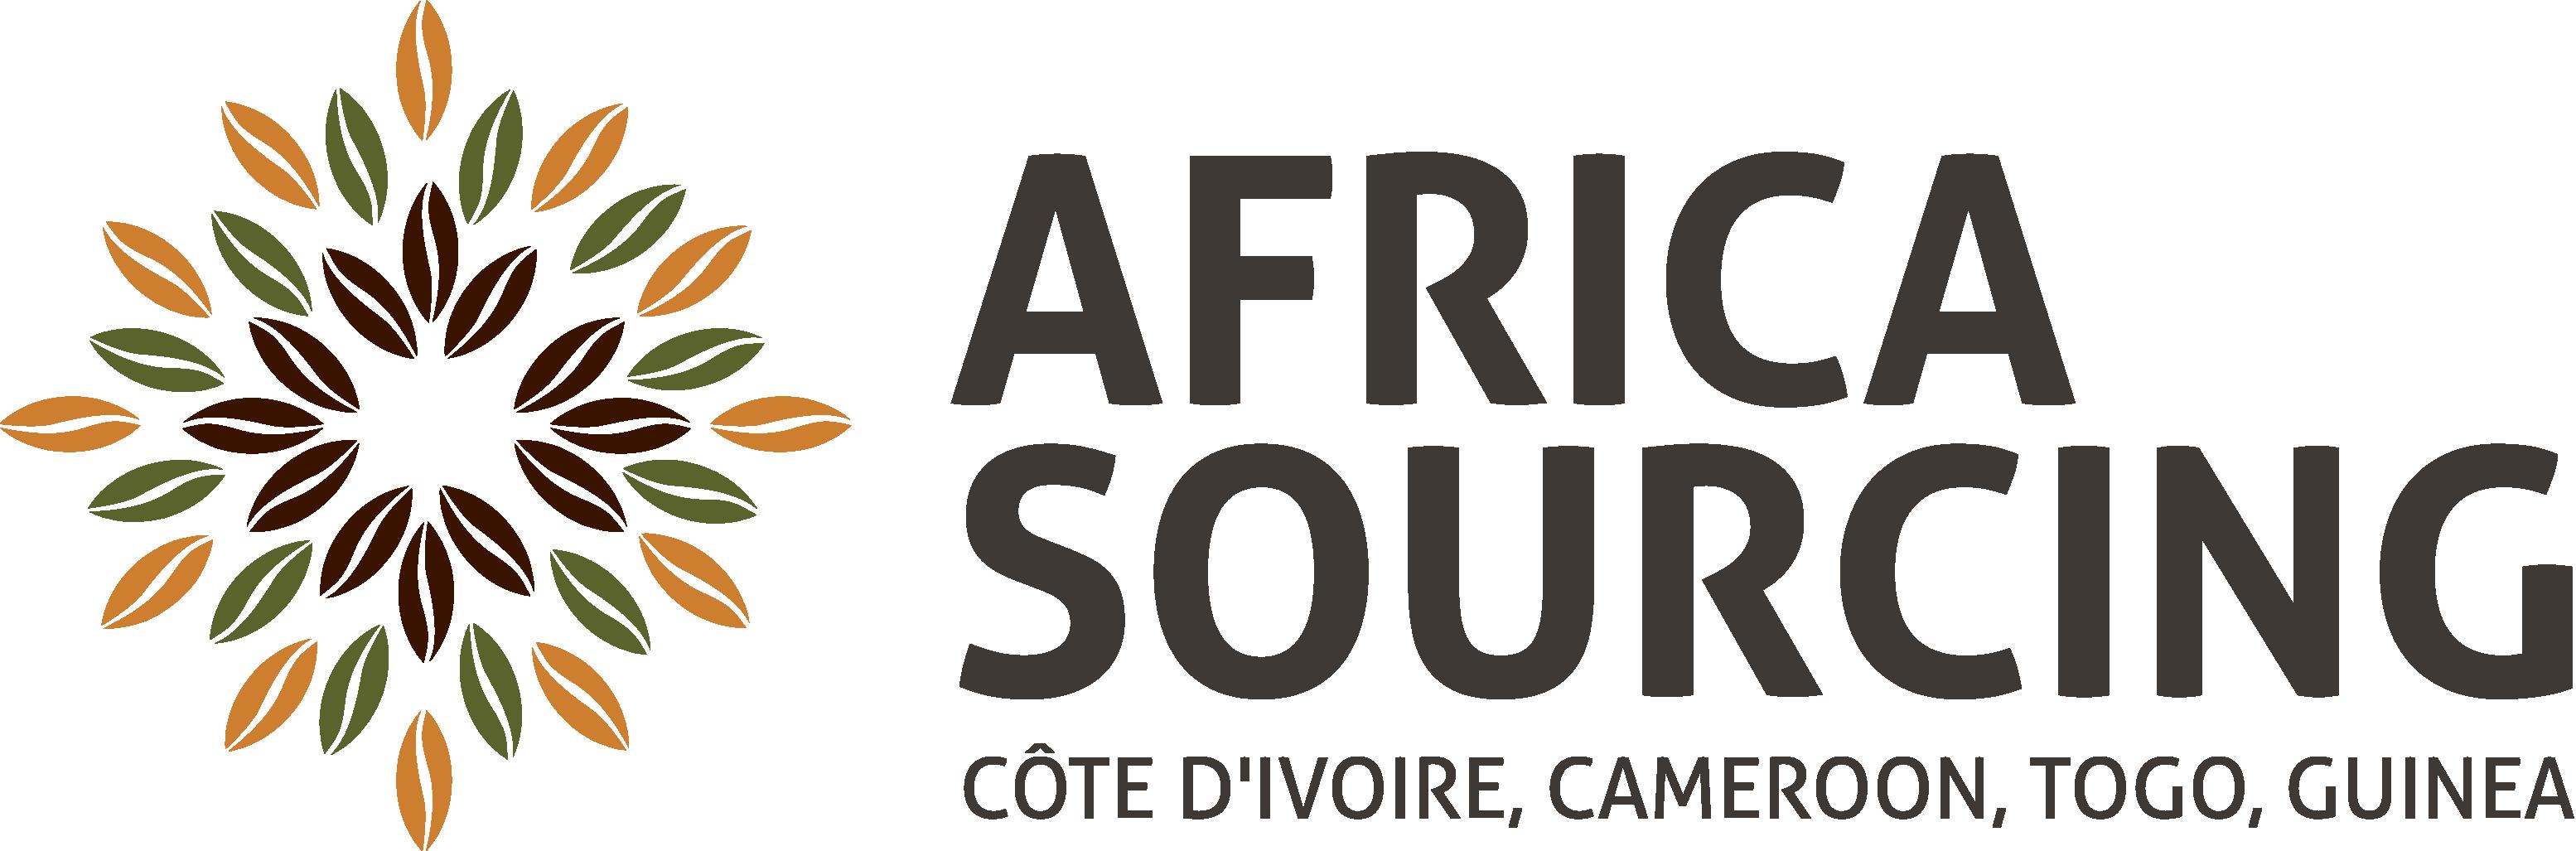 Africa Sourcing logo